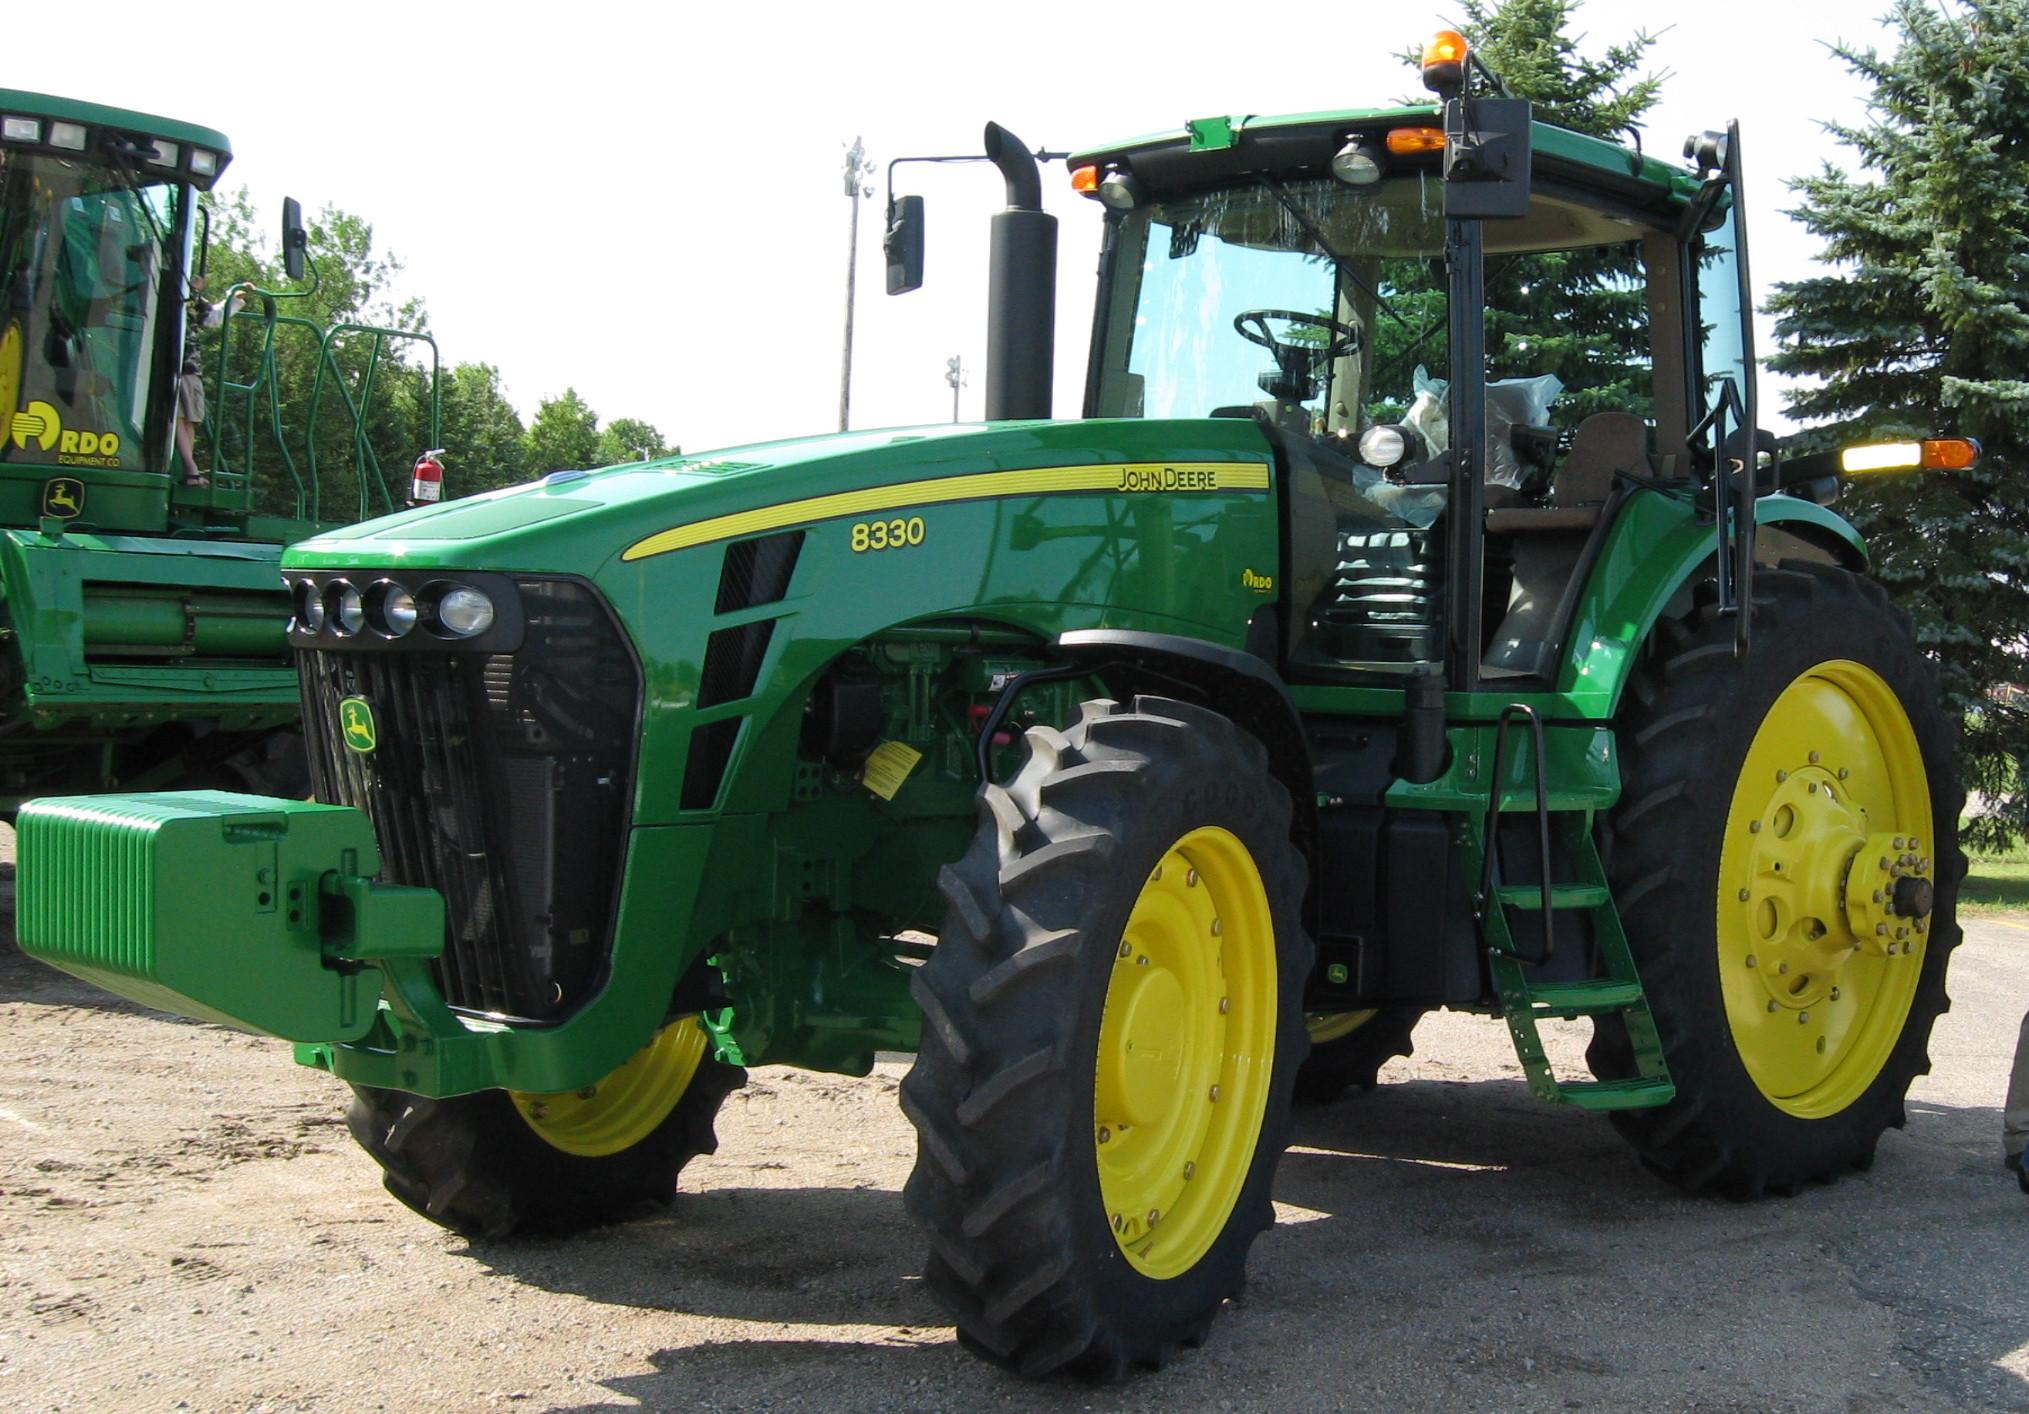 File:John Deere 8330 tractor, Kindred ND, 20090801.jpg